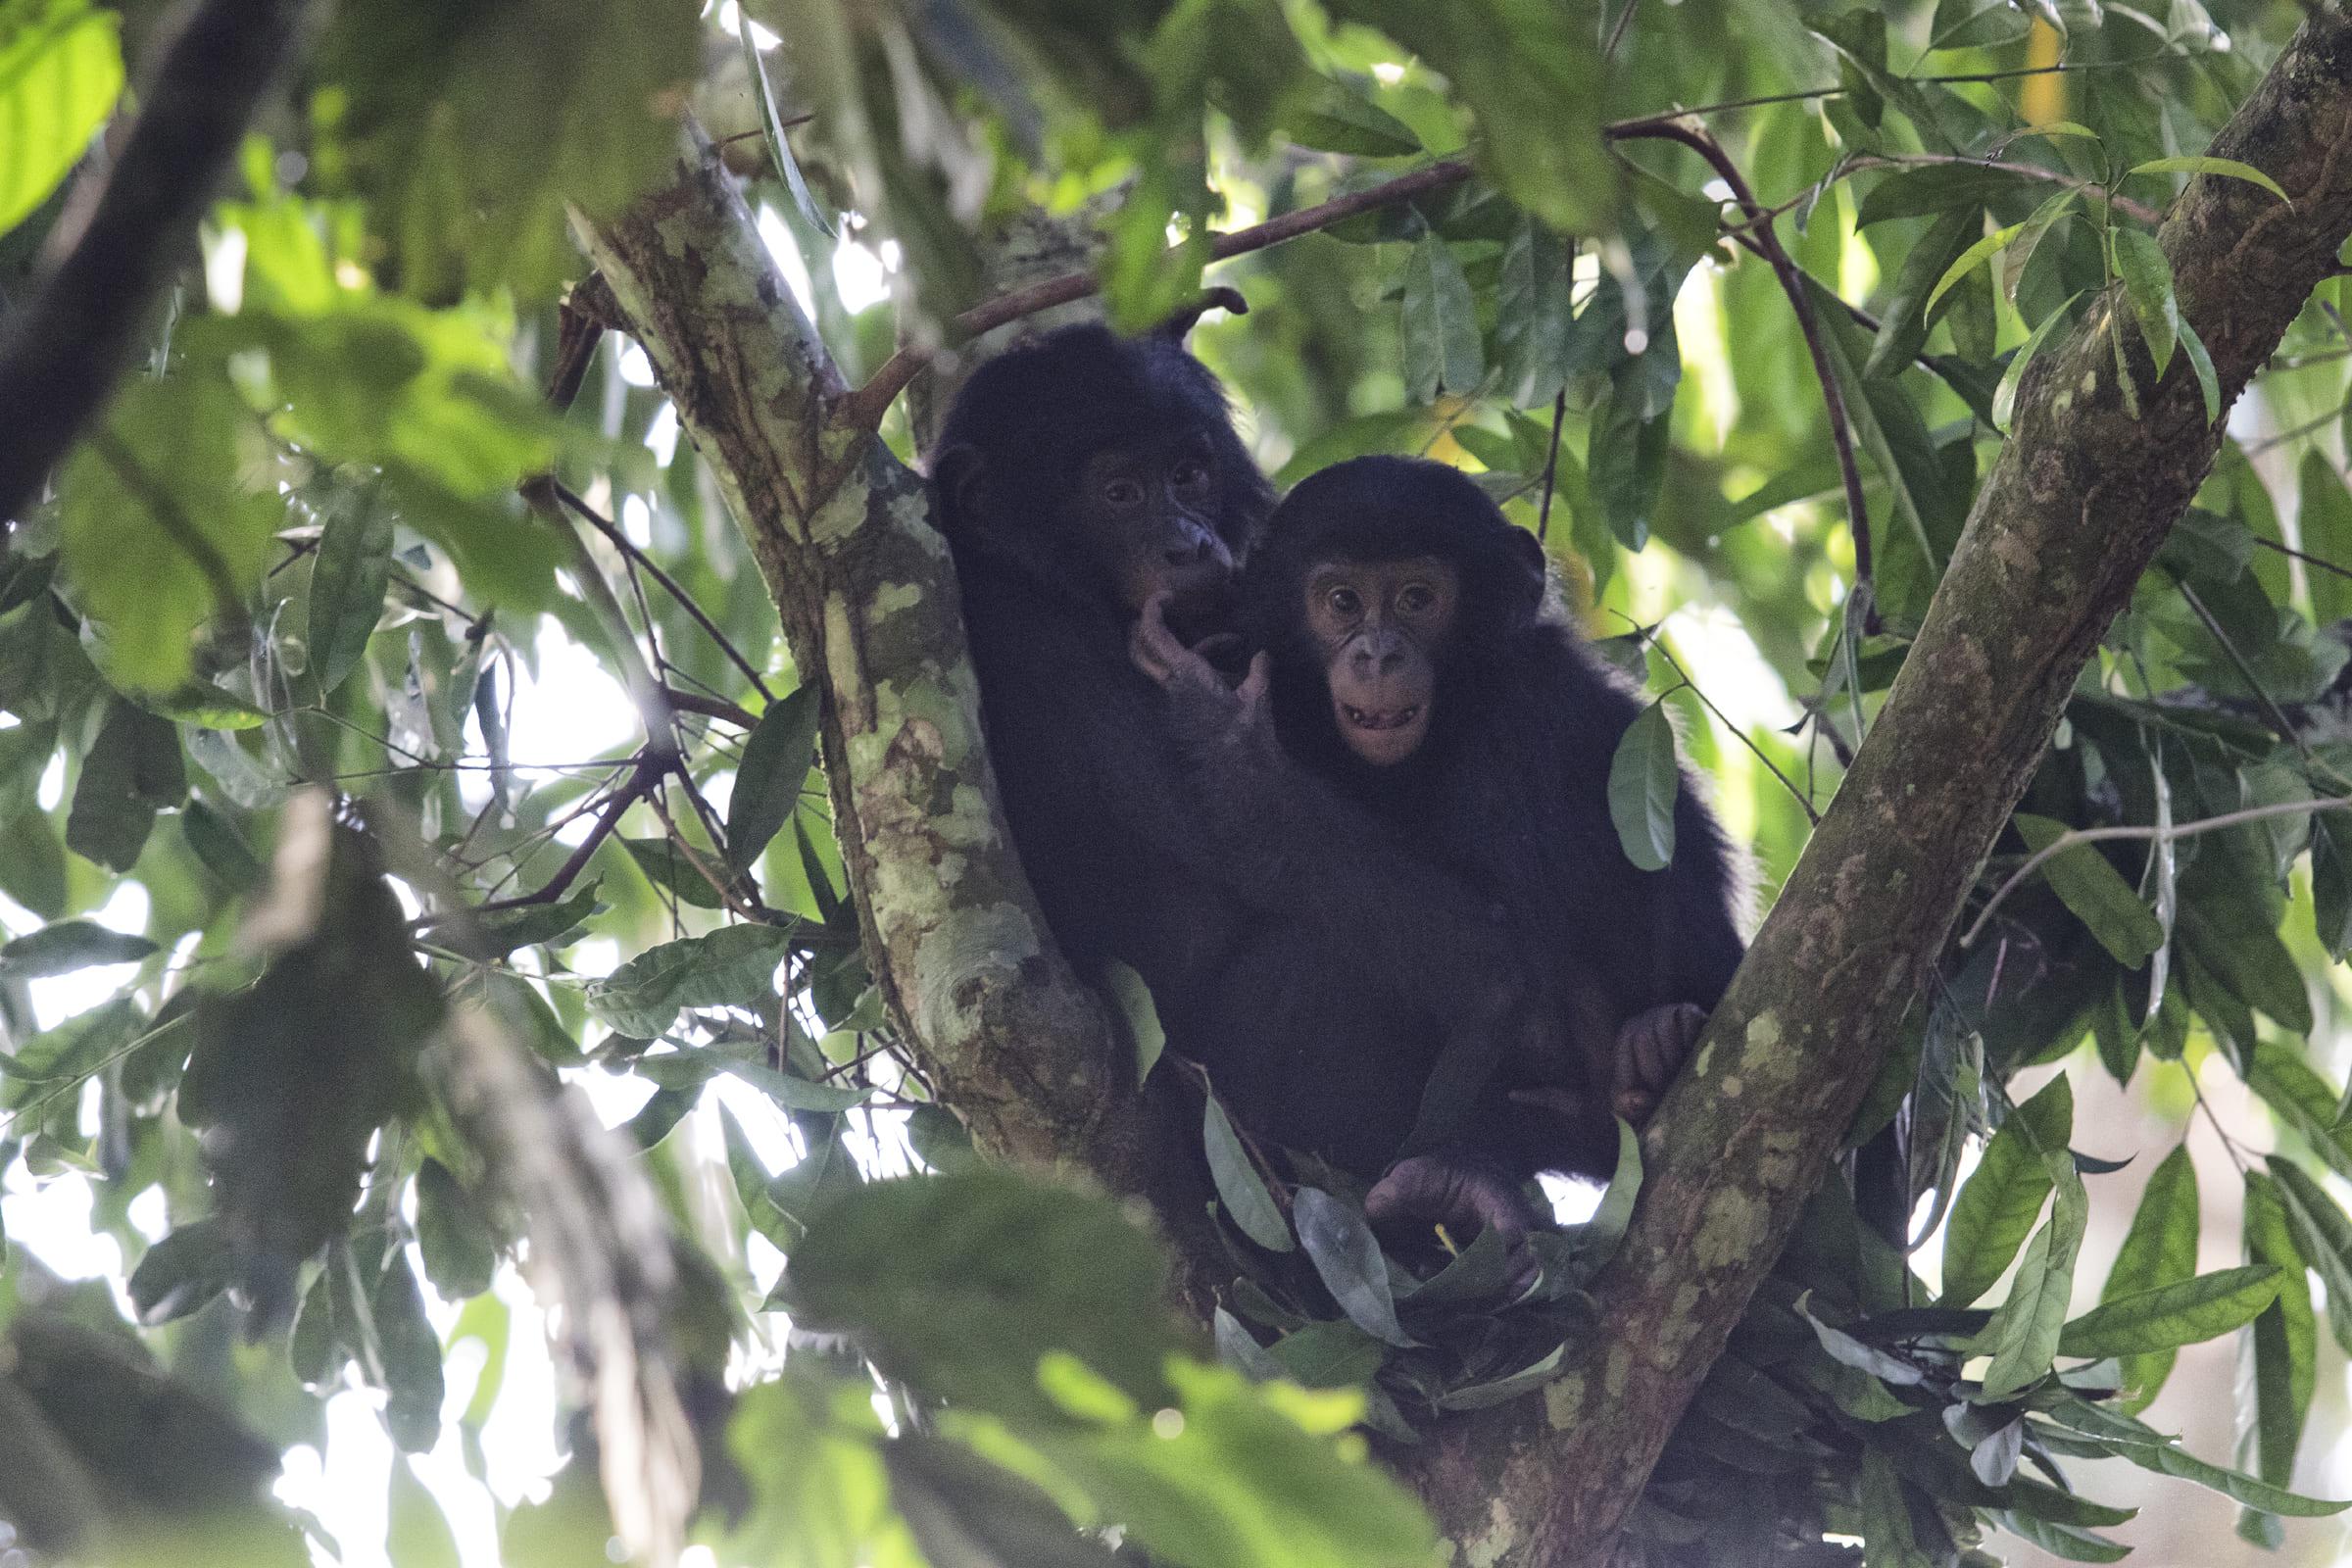 Zwei Bonobos im Baum